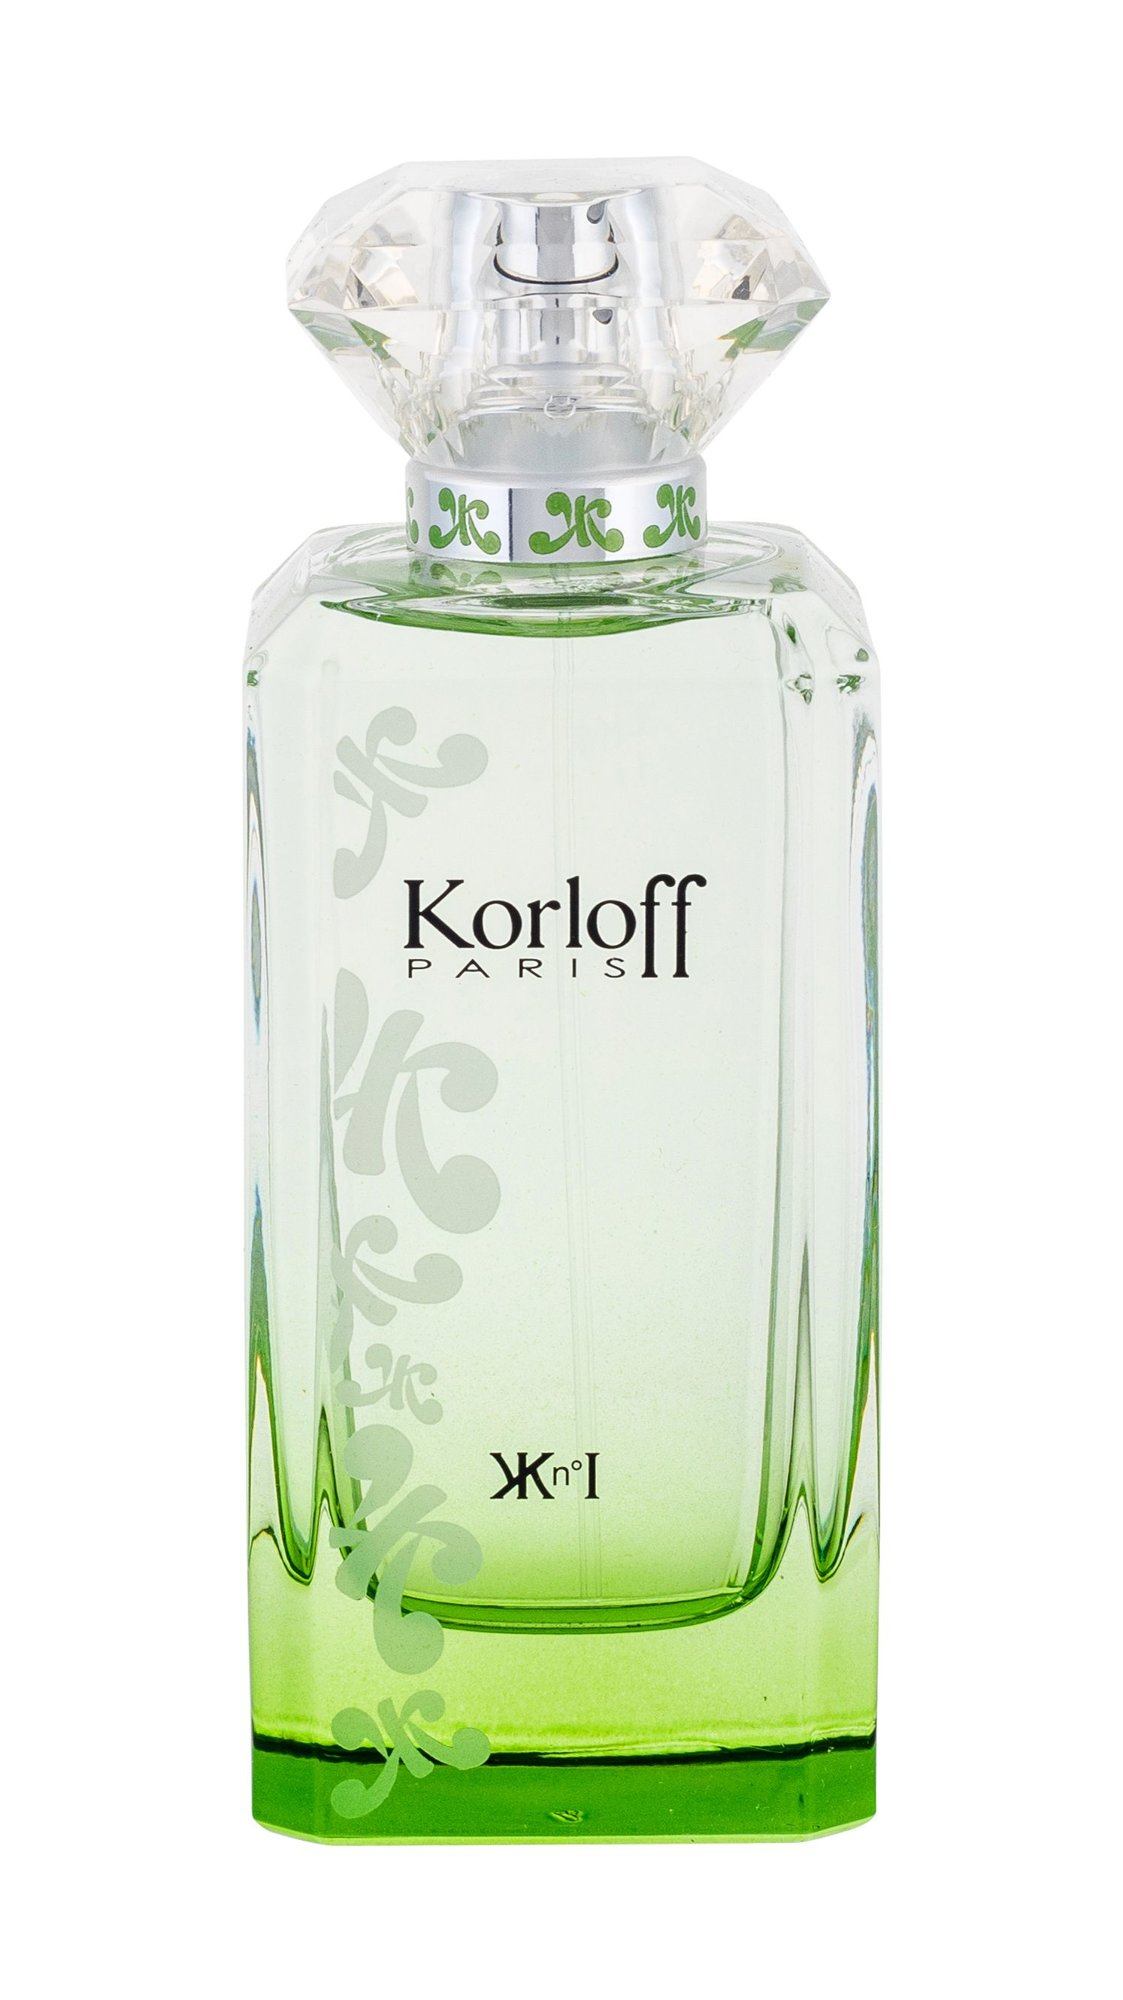 Korloff Paris N° I Green Diamond EDT 88ml